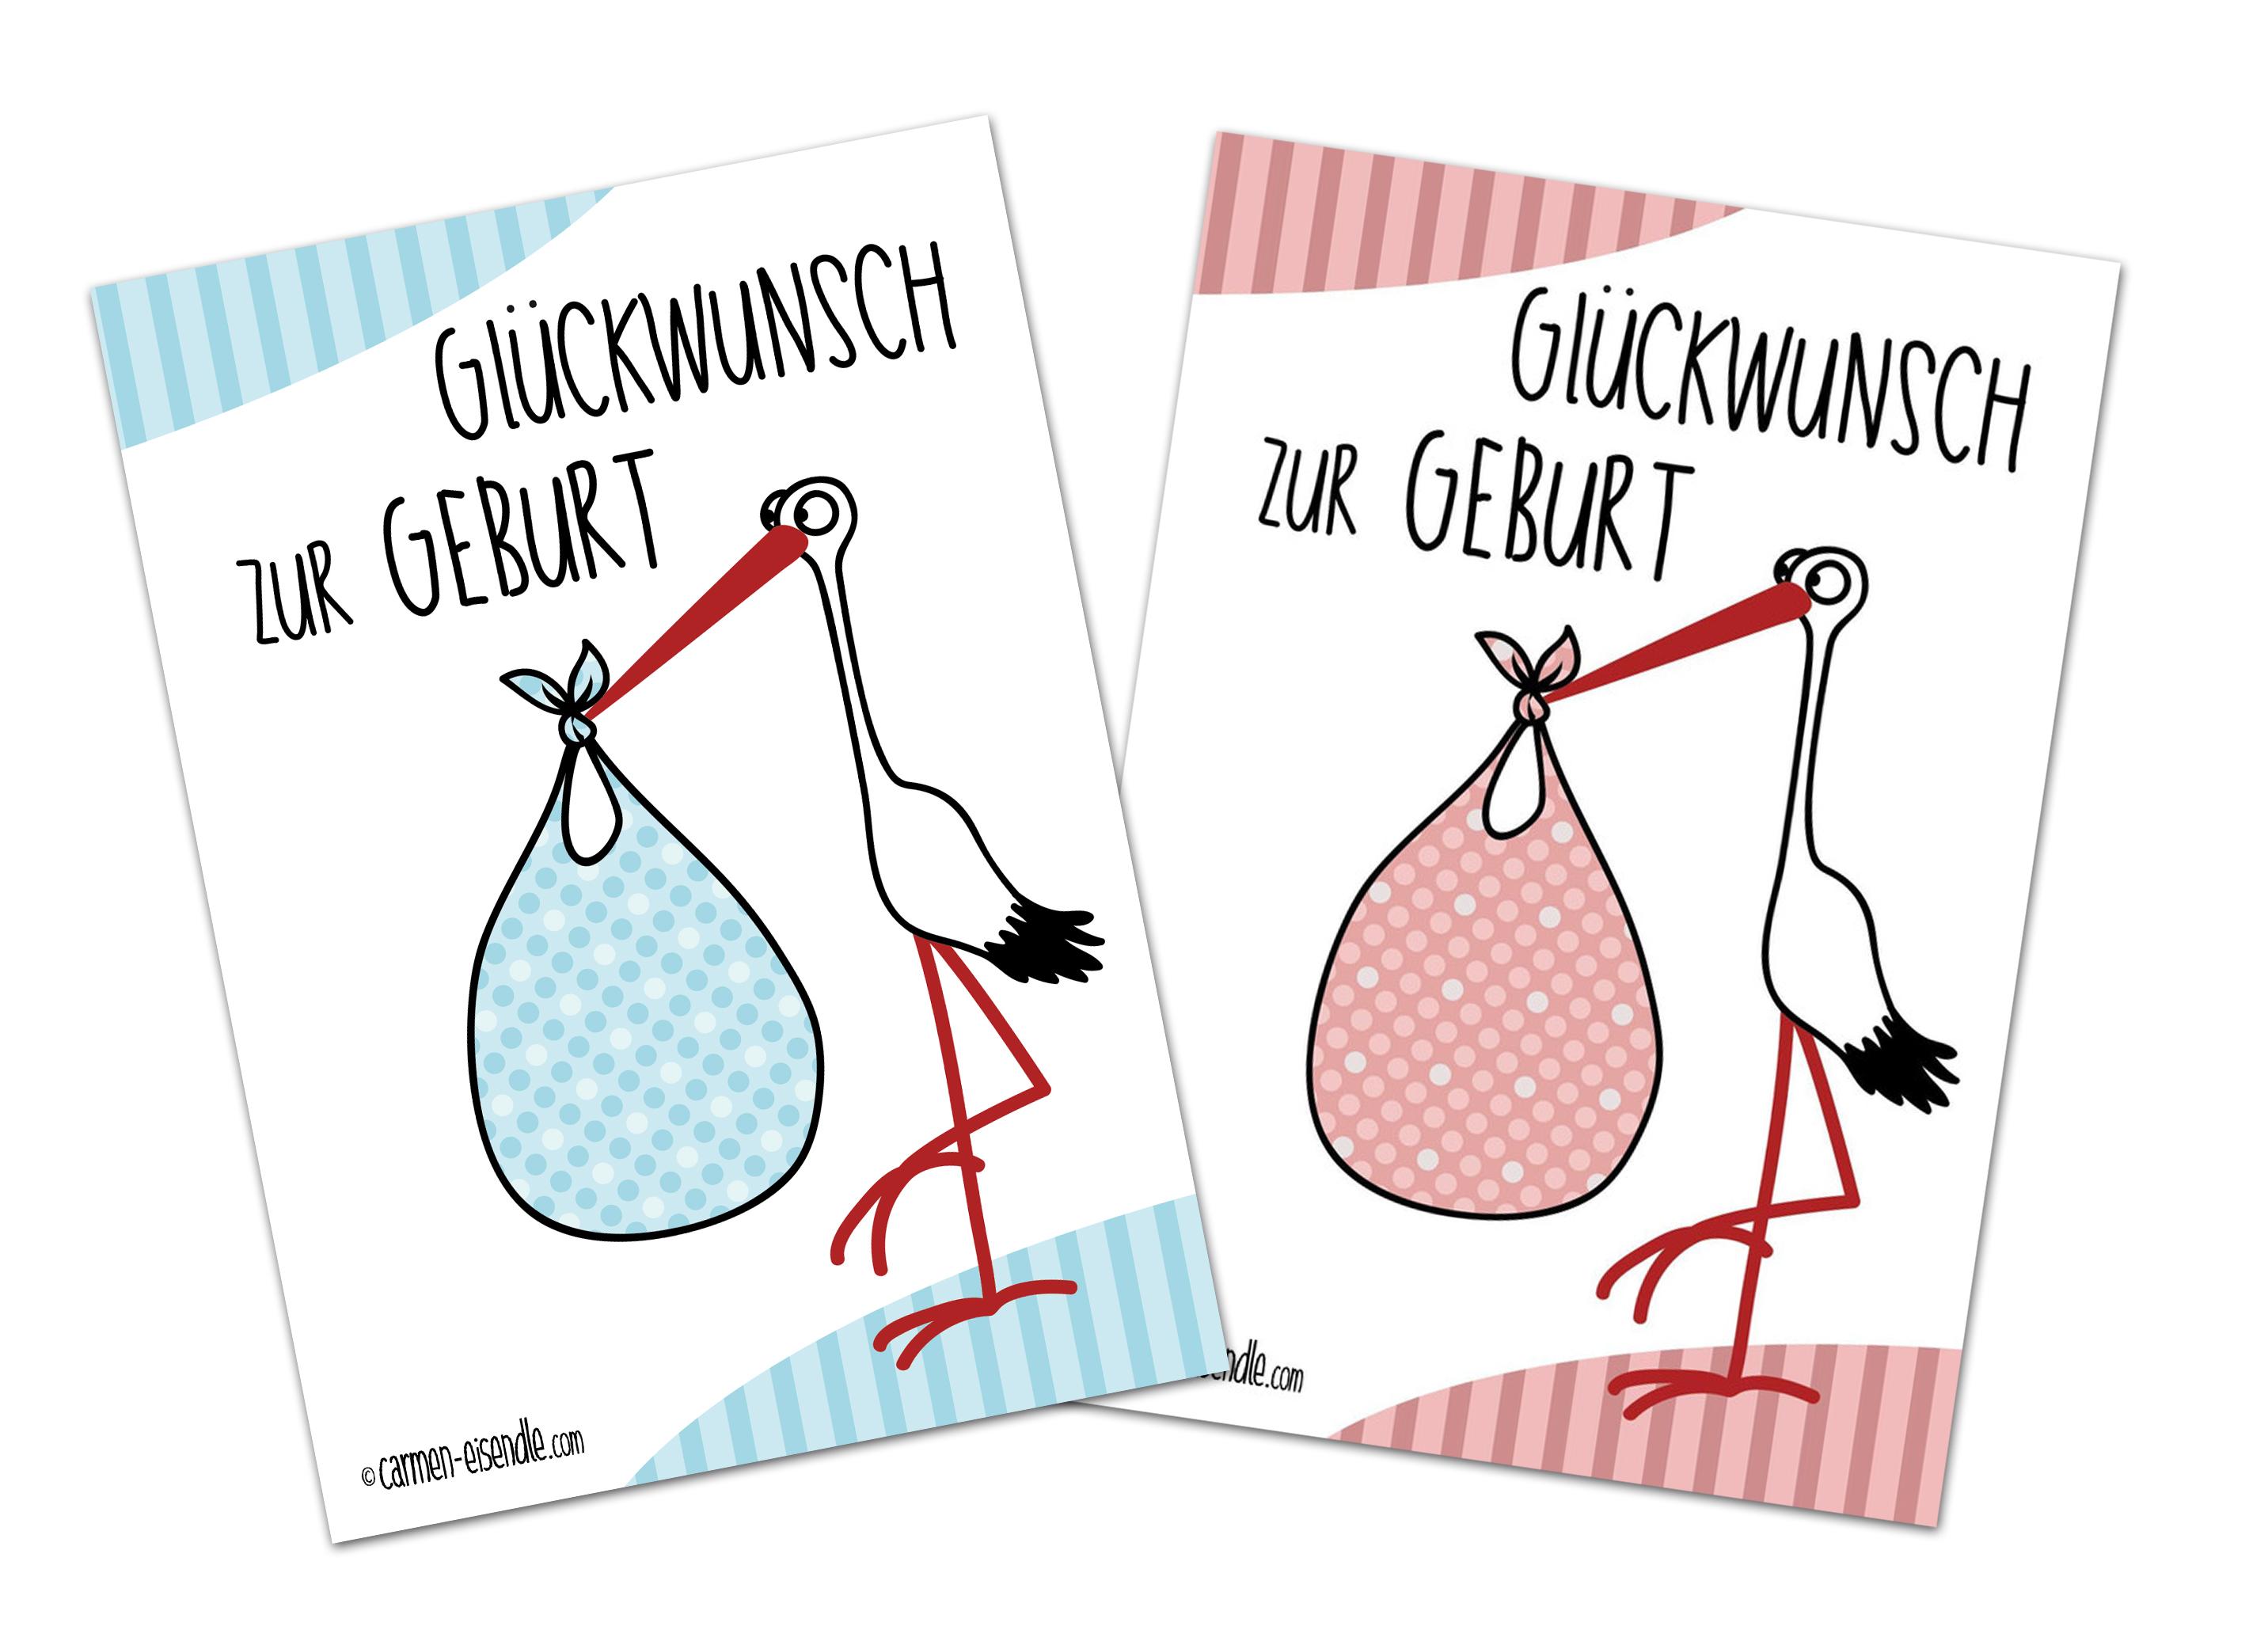 storch_glueckwunschkartenset